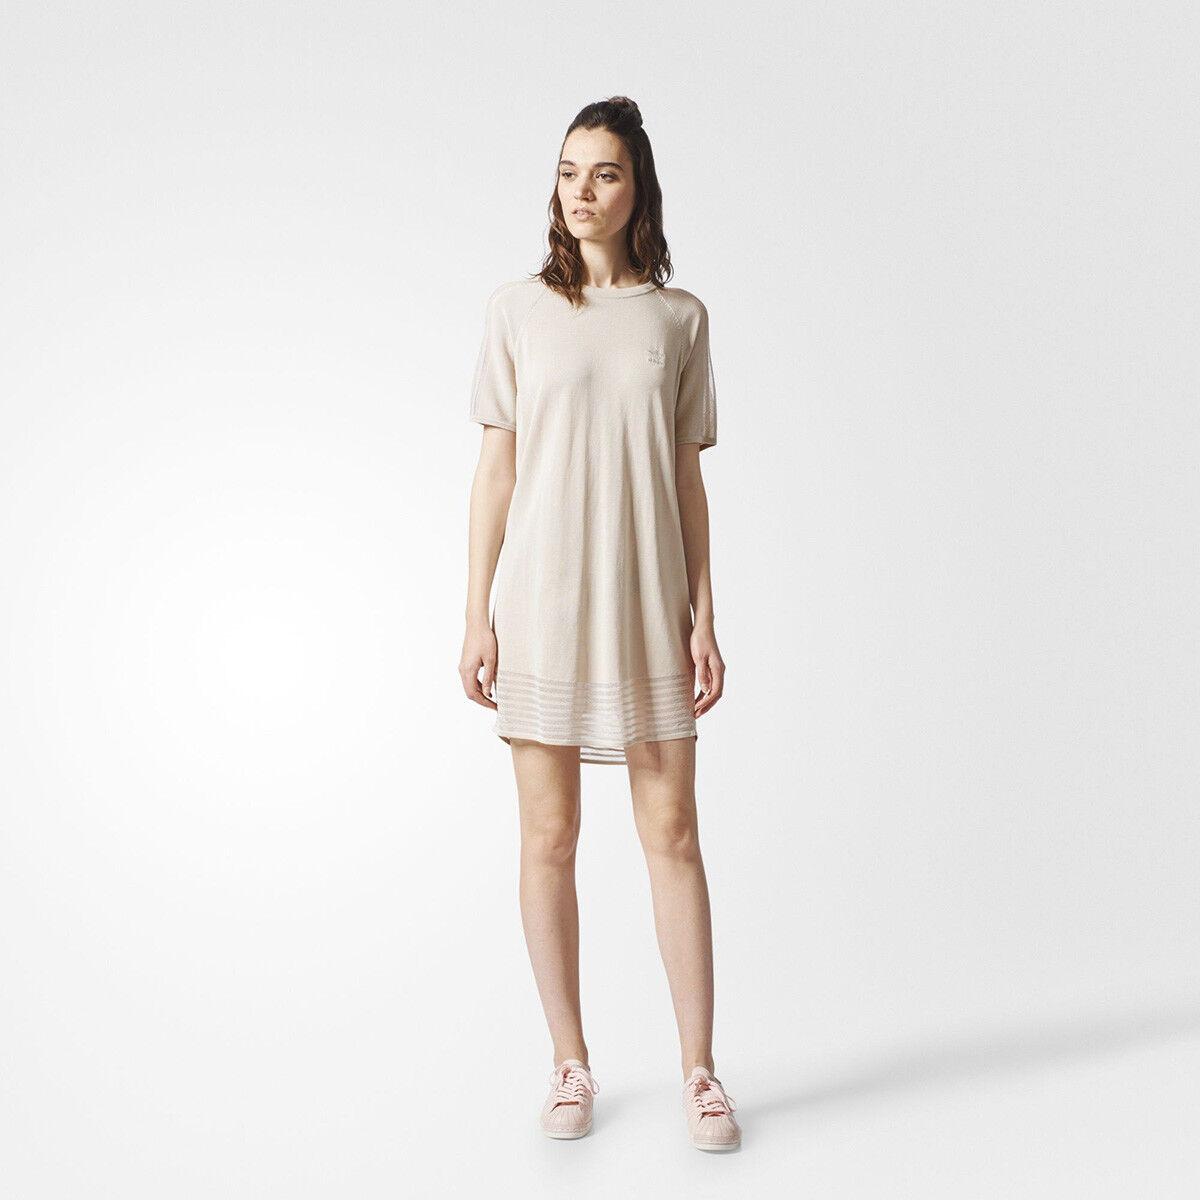 Adidas Originals WMNS Tee dress damen sail BR2229